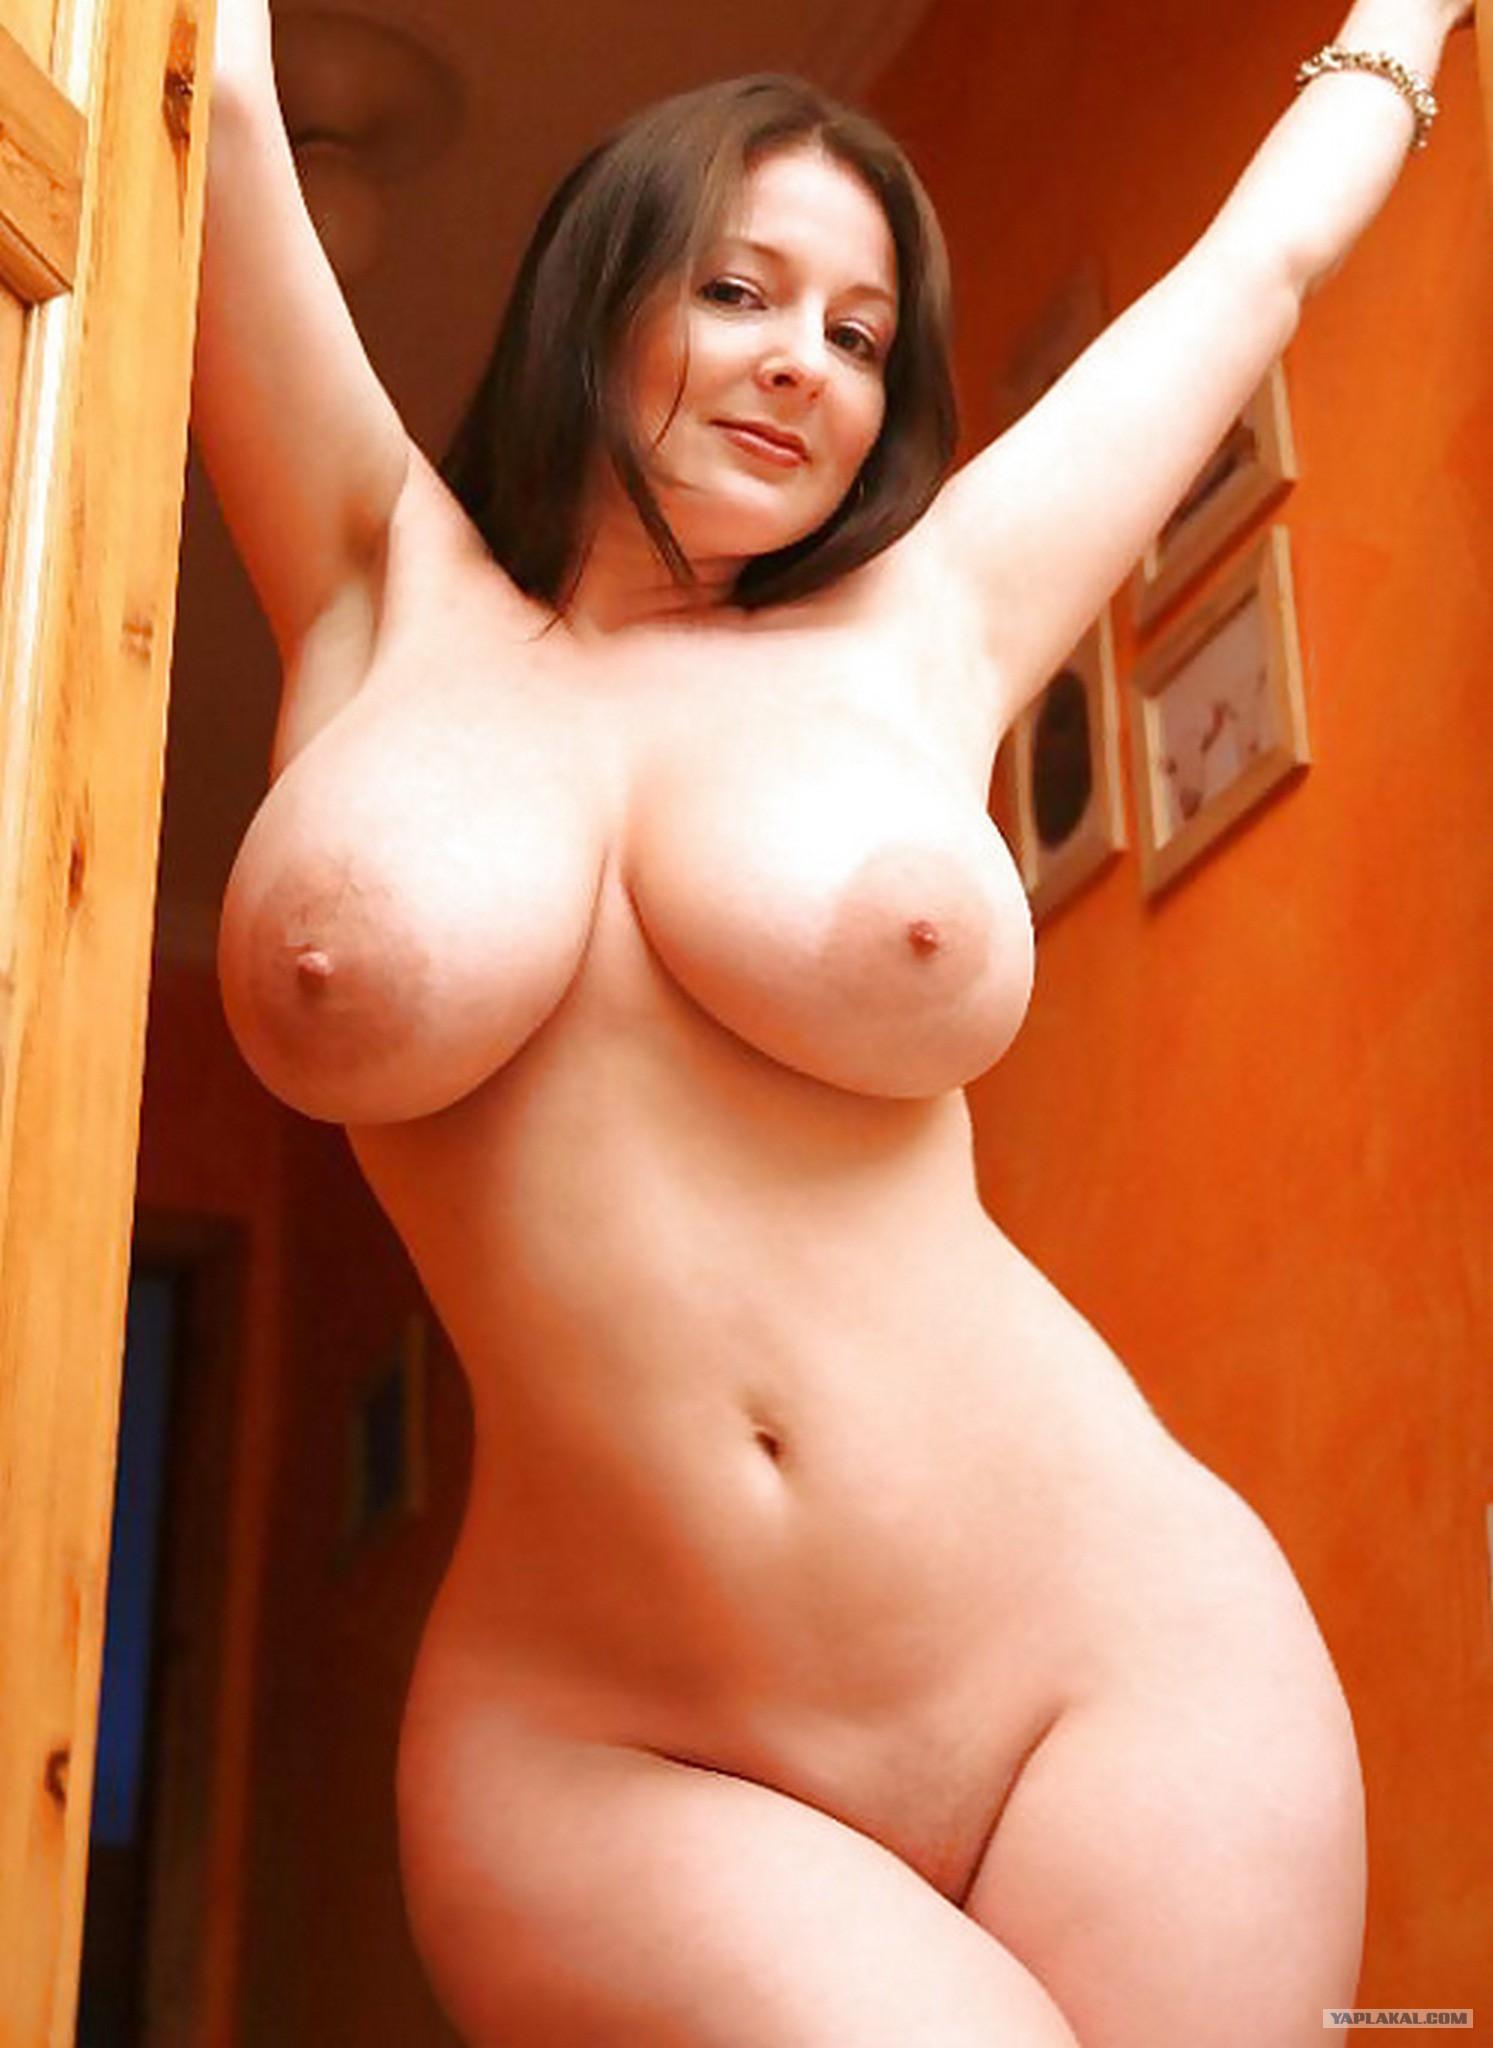 Порно ролики зрелые с широкими бёдрами фото 682-471